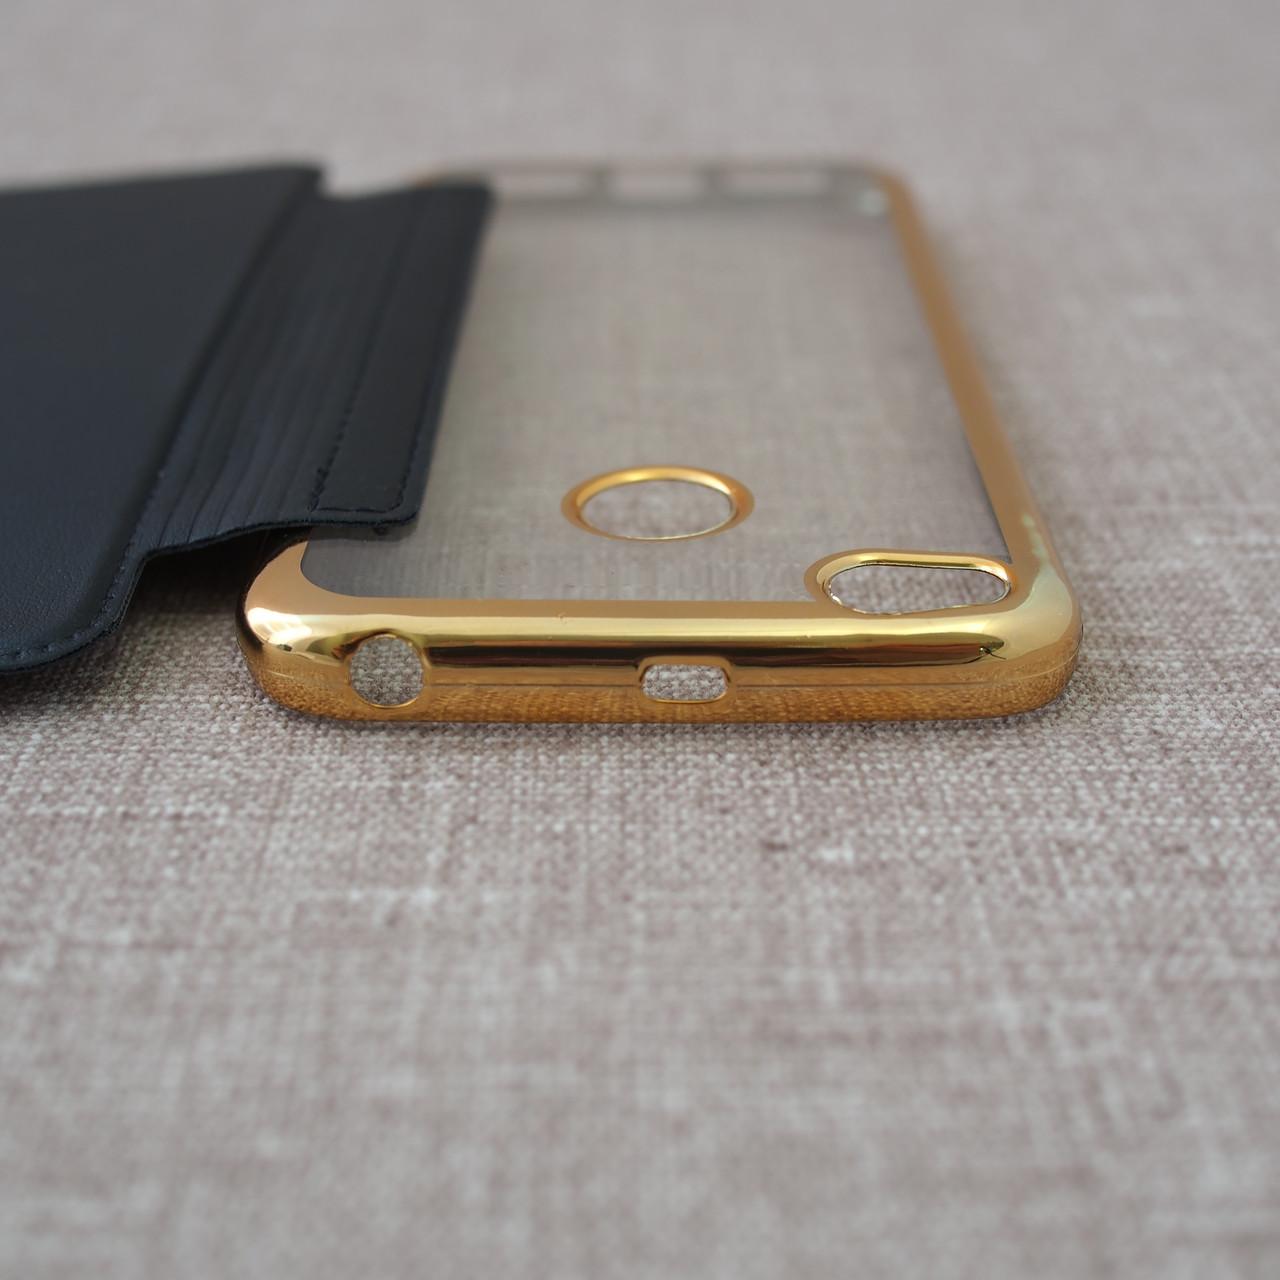 Чехлы для Xiaomi Redmi 4X Book Cover 4x black Для телефона